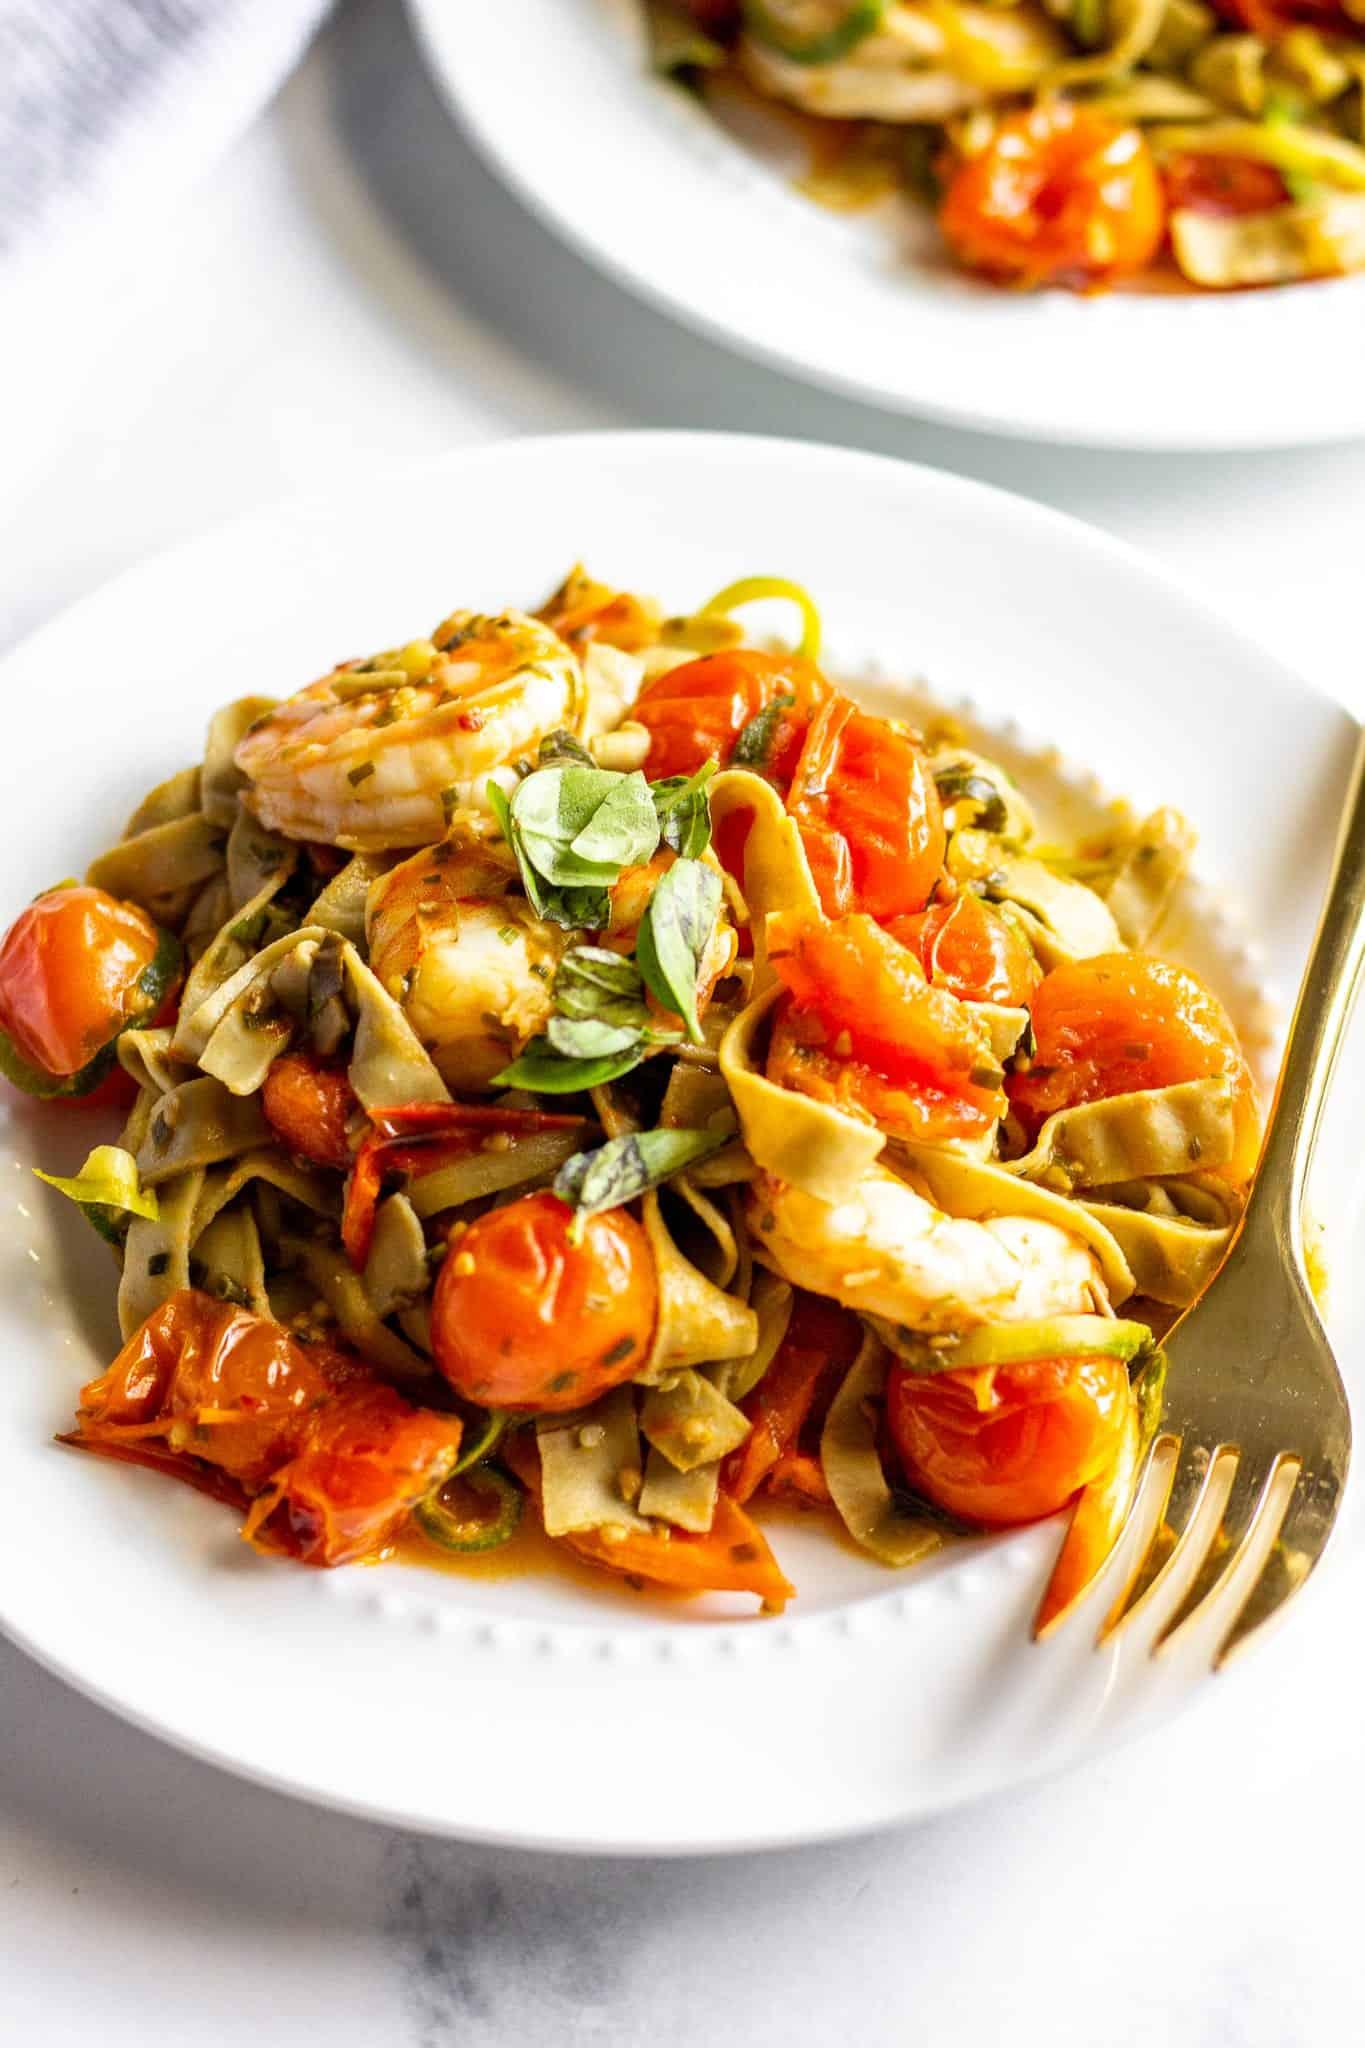 Cherry Tomato Pasta and Shrimp #lowfodmap #glutenfree #dairyfree #tararochfordnutrition